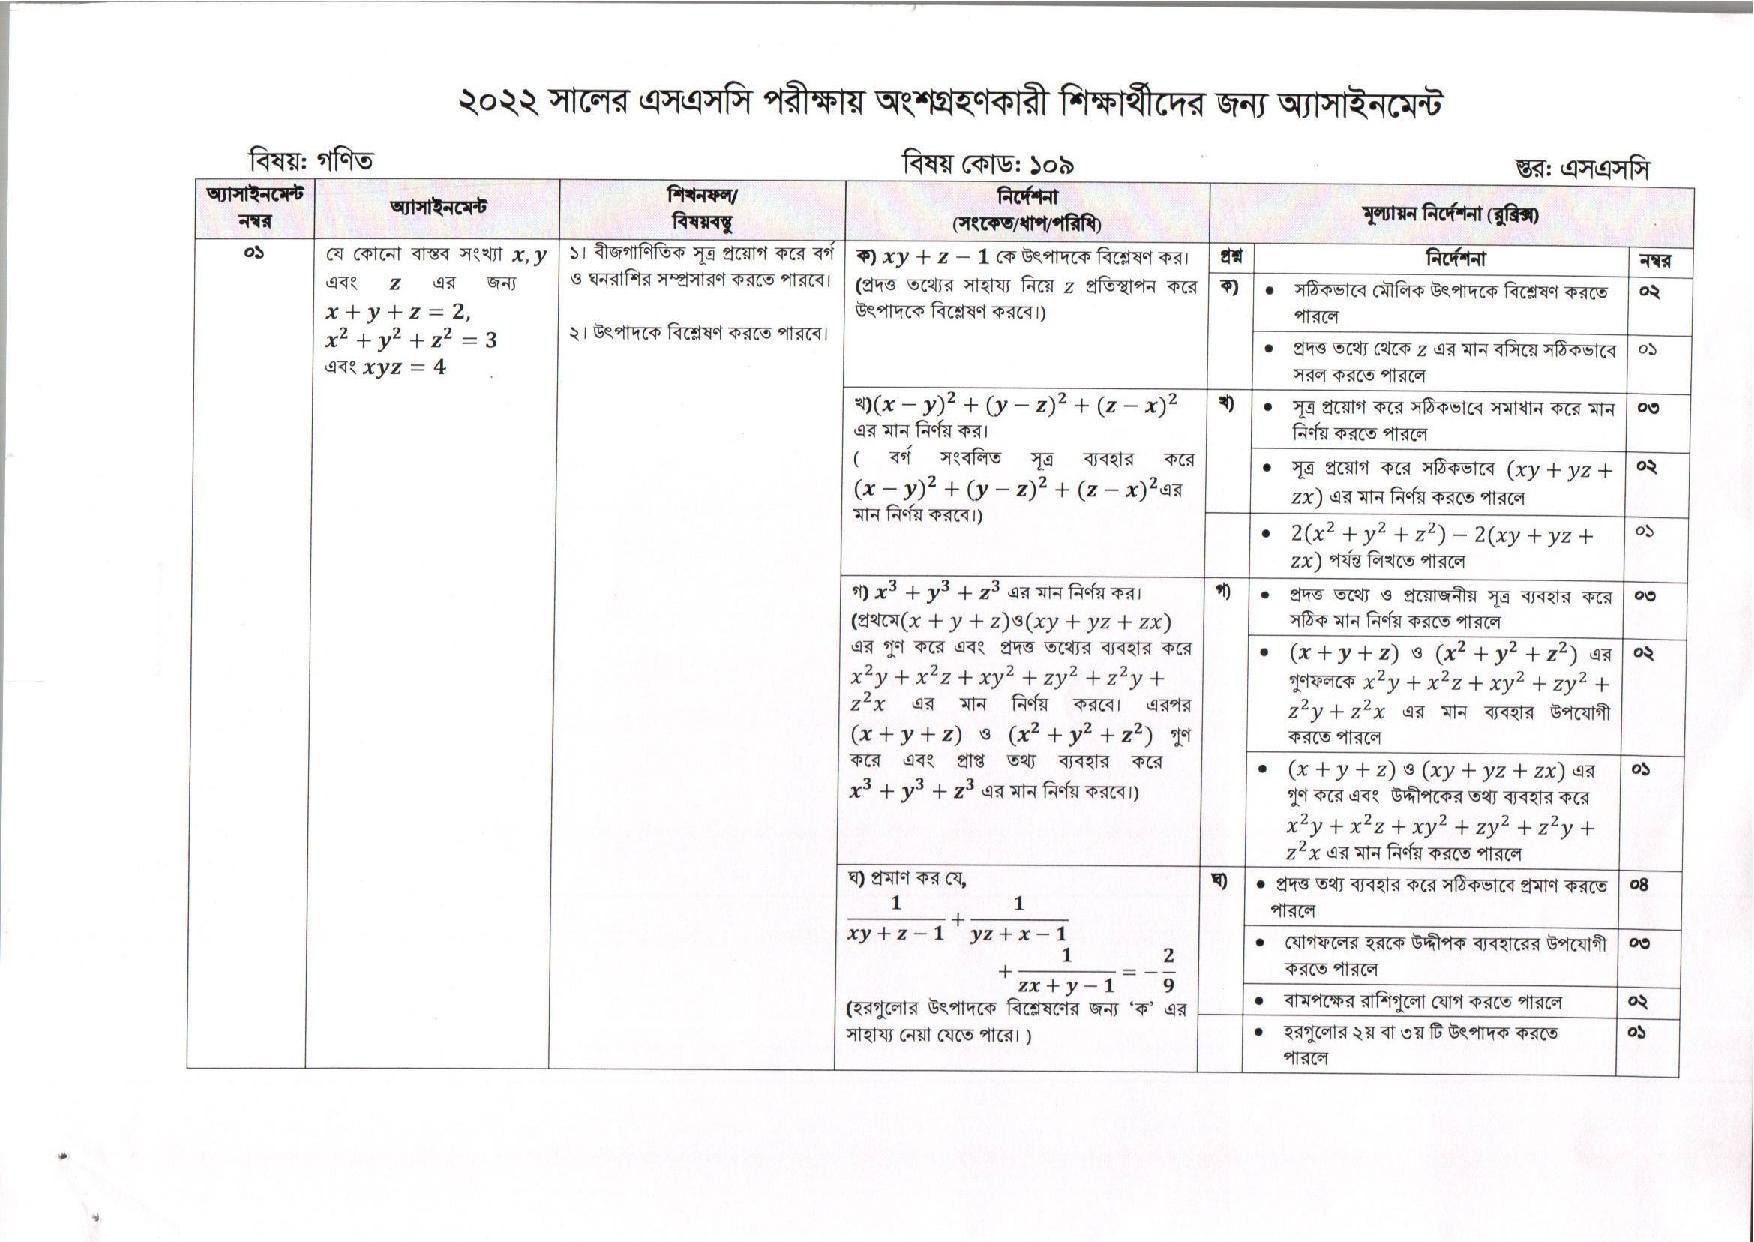 homework-1-page-004